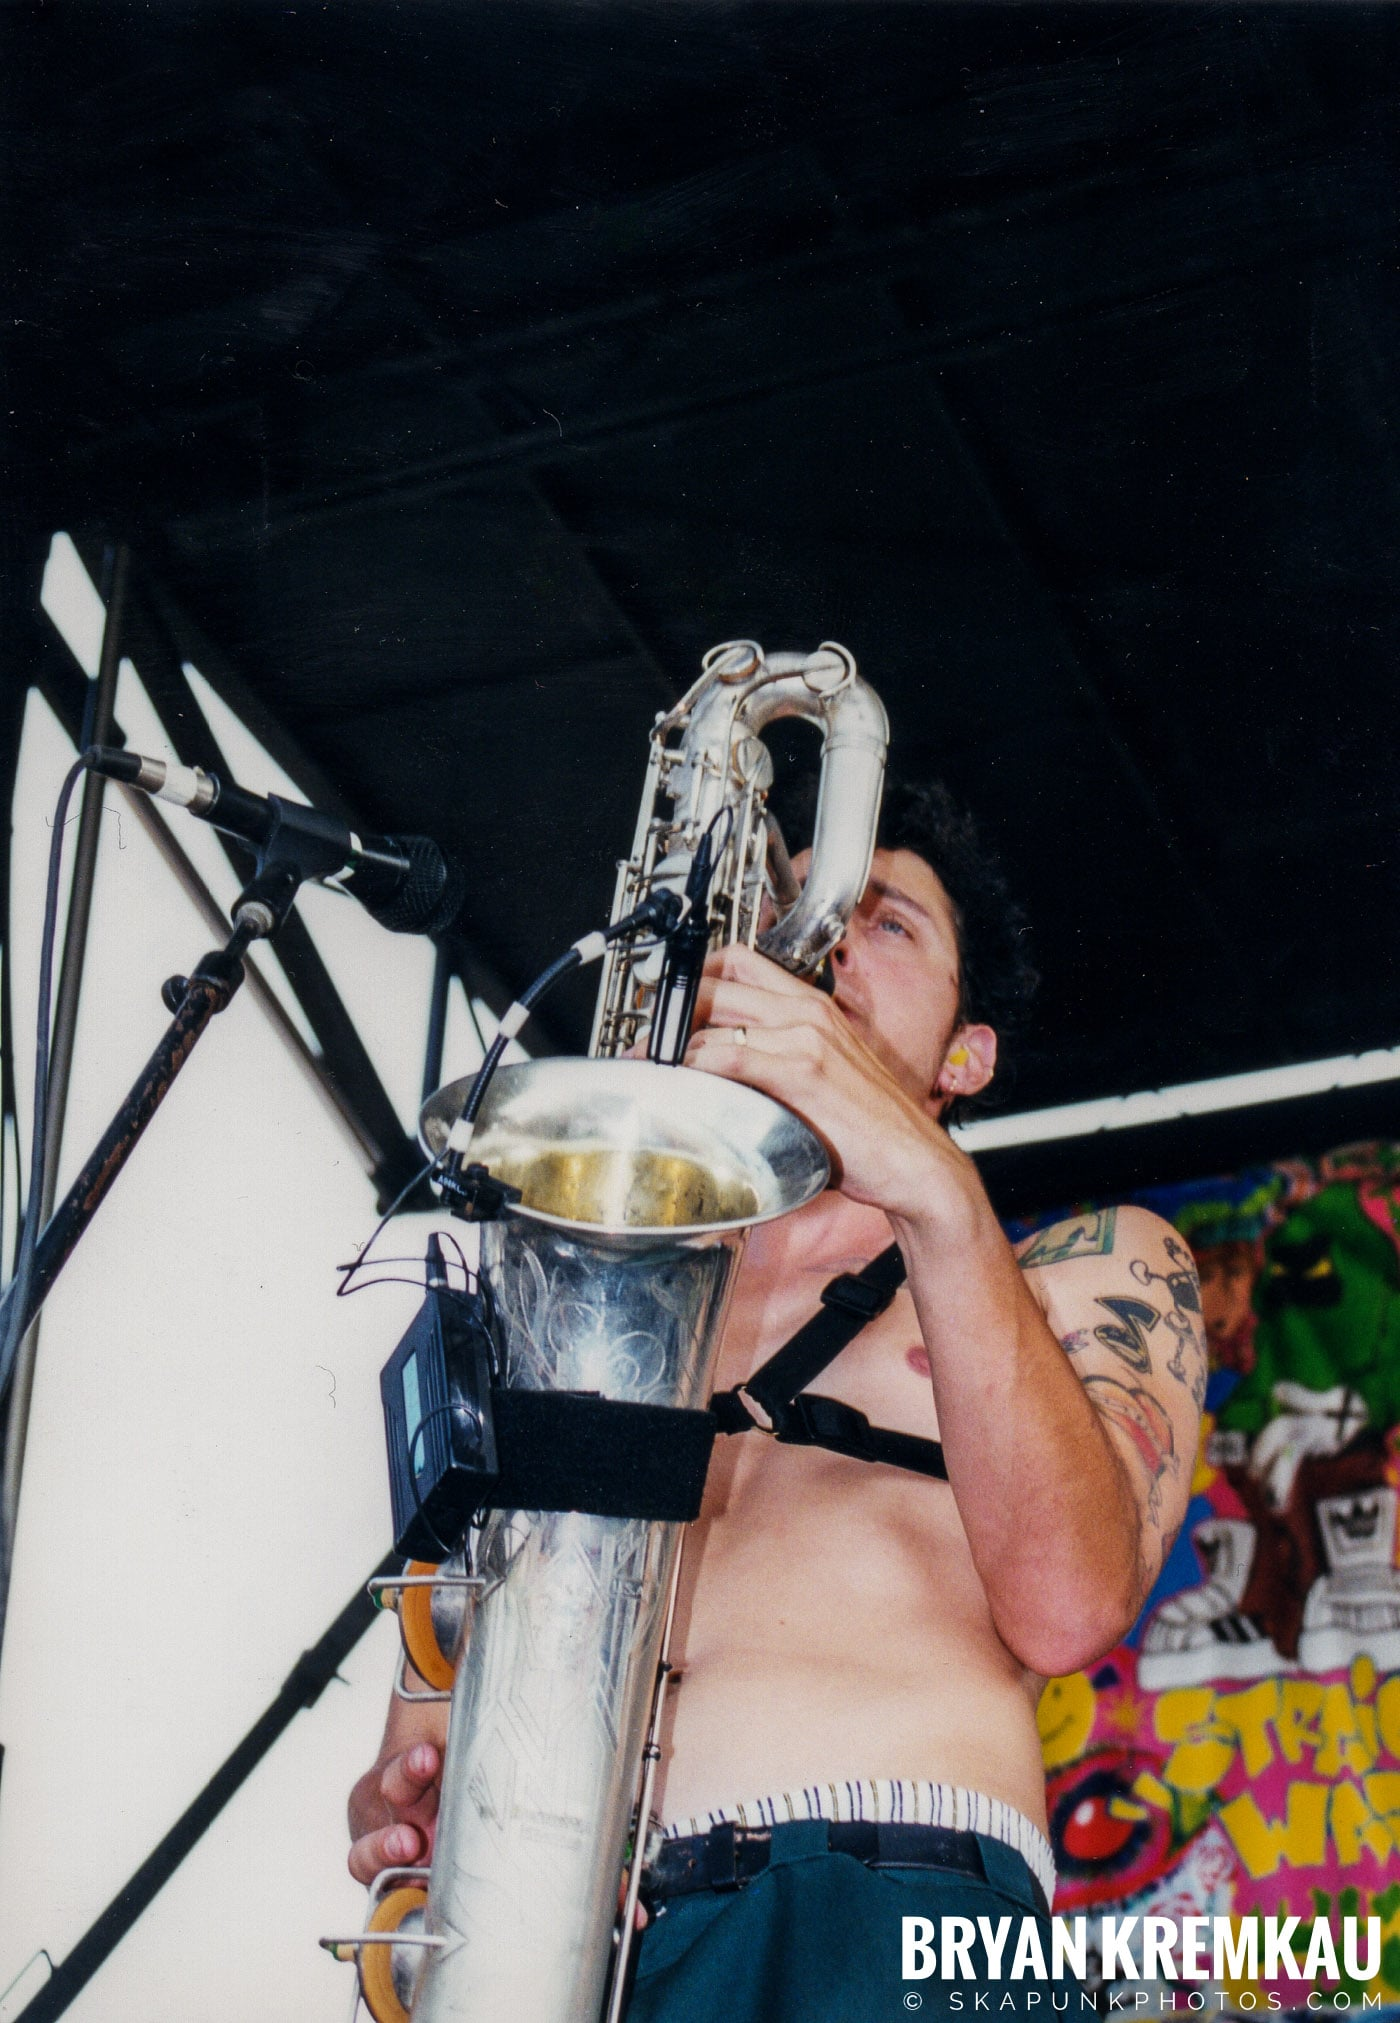 Less Than Jake @ Vans Warped Tour, Randall's Island, NYC - 7.16.99 (5)